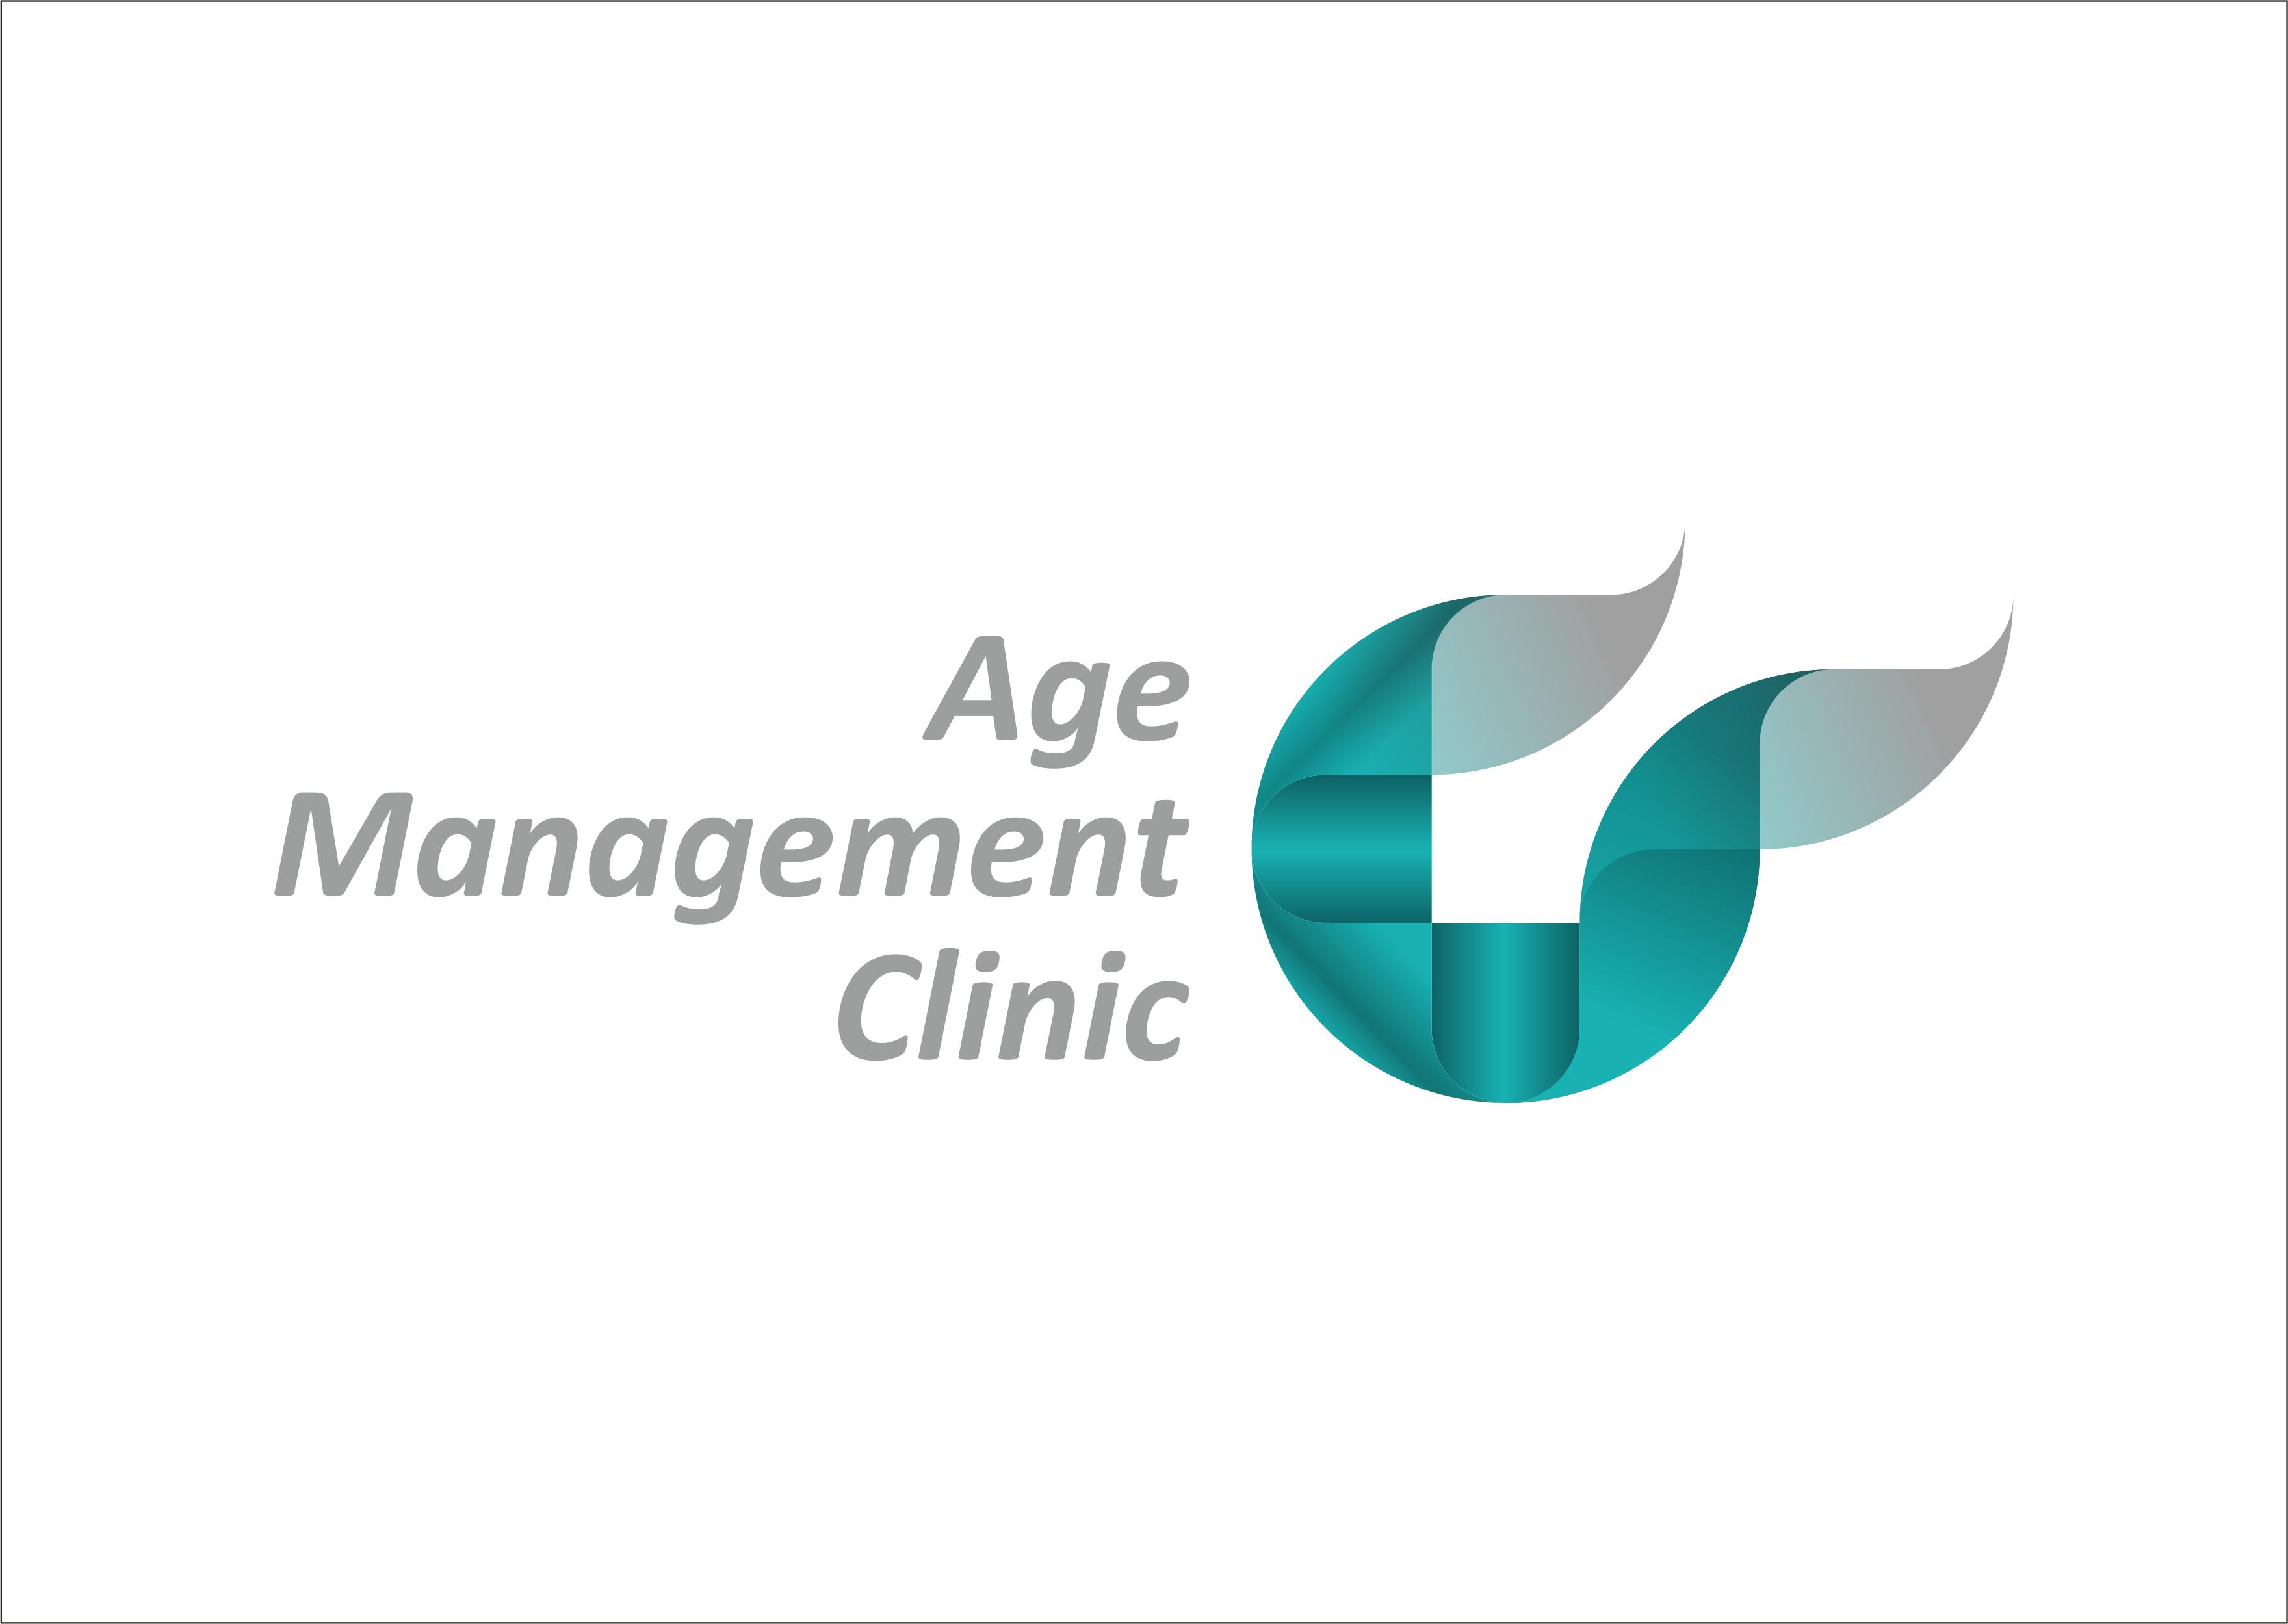 Логотип для медицинского центра (клиники)  фото f_7315b98d3d565efc.png